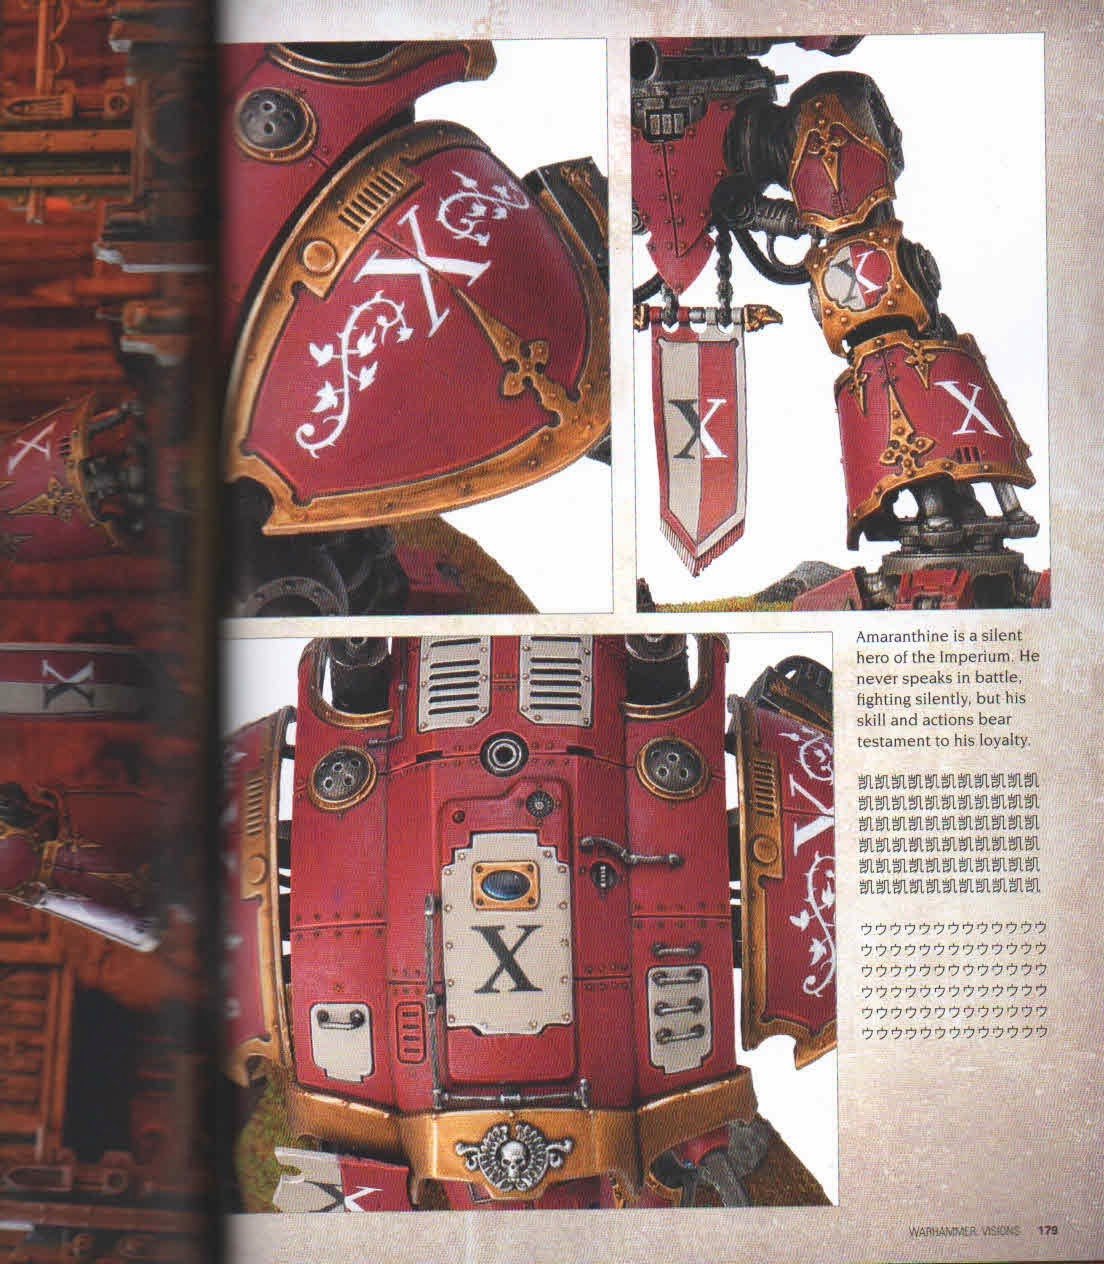 Errores Warhammer: Visions, número 3, página 179